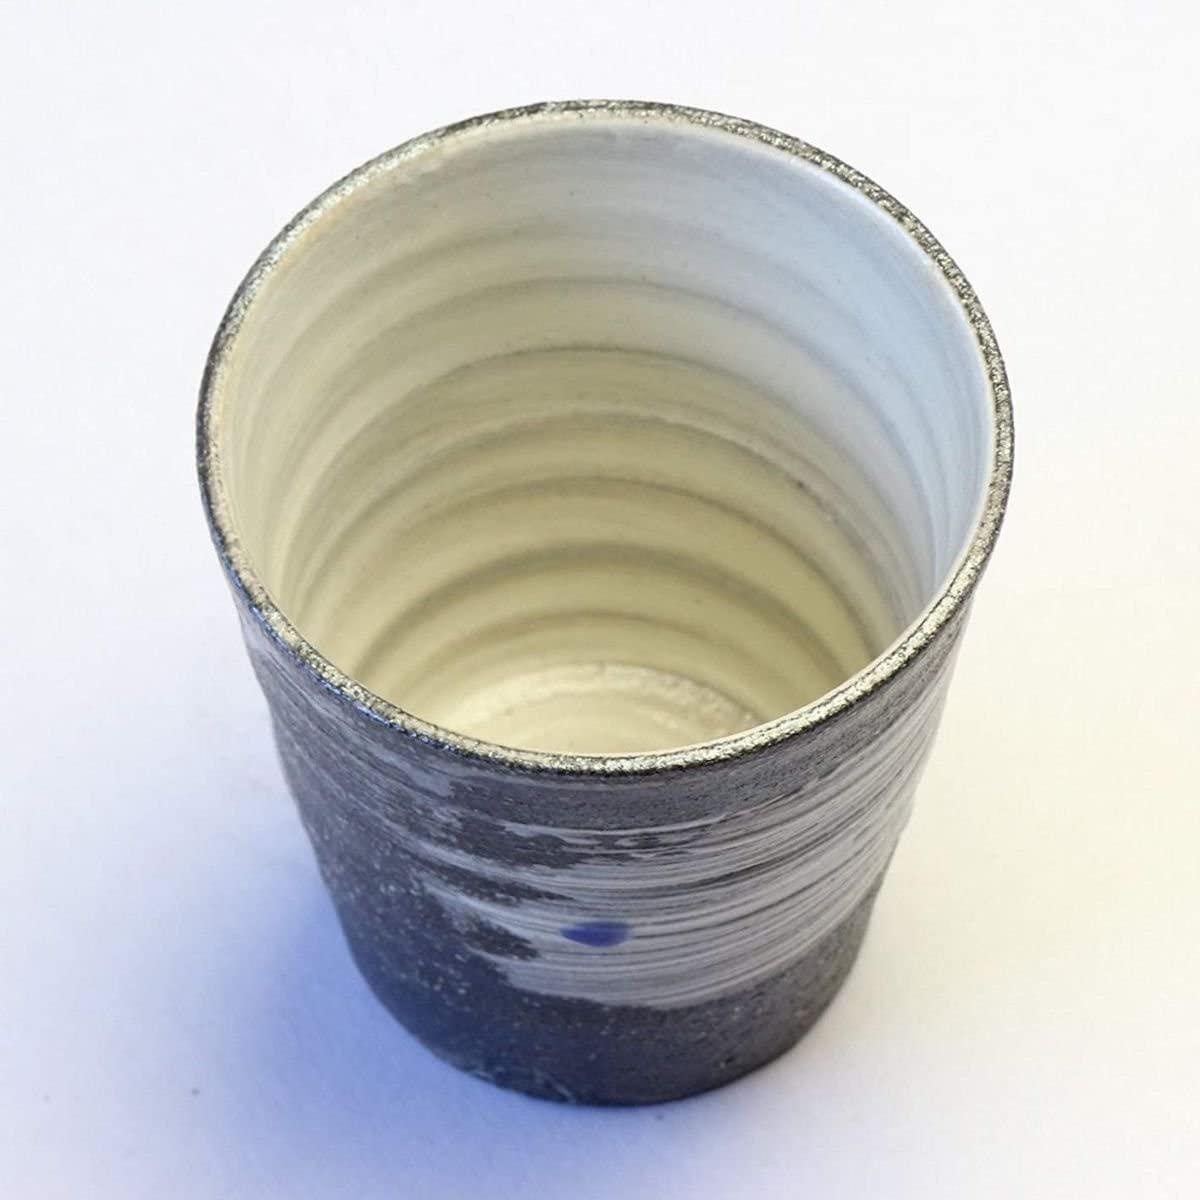 CtoC JAPAN Select 信楽焼 焼酎グラス 天の川(青) W919-07の商品画像3